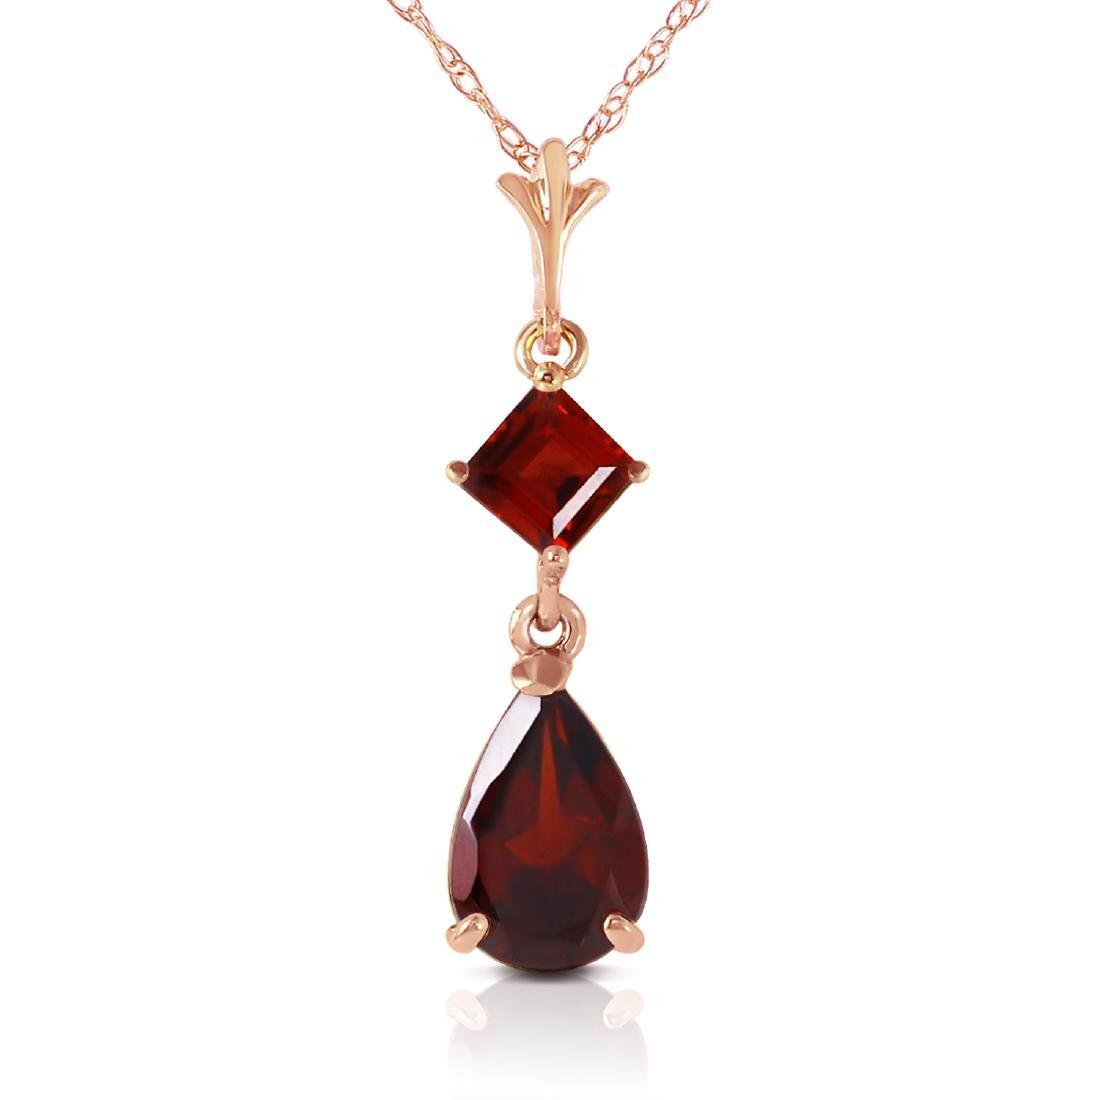 Genuine 2 ctw Garnet Necklace Jewelry 14KT Rose Gold -